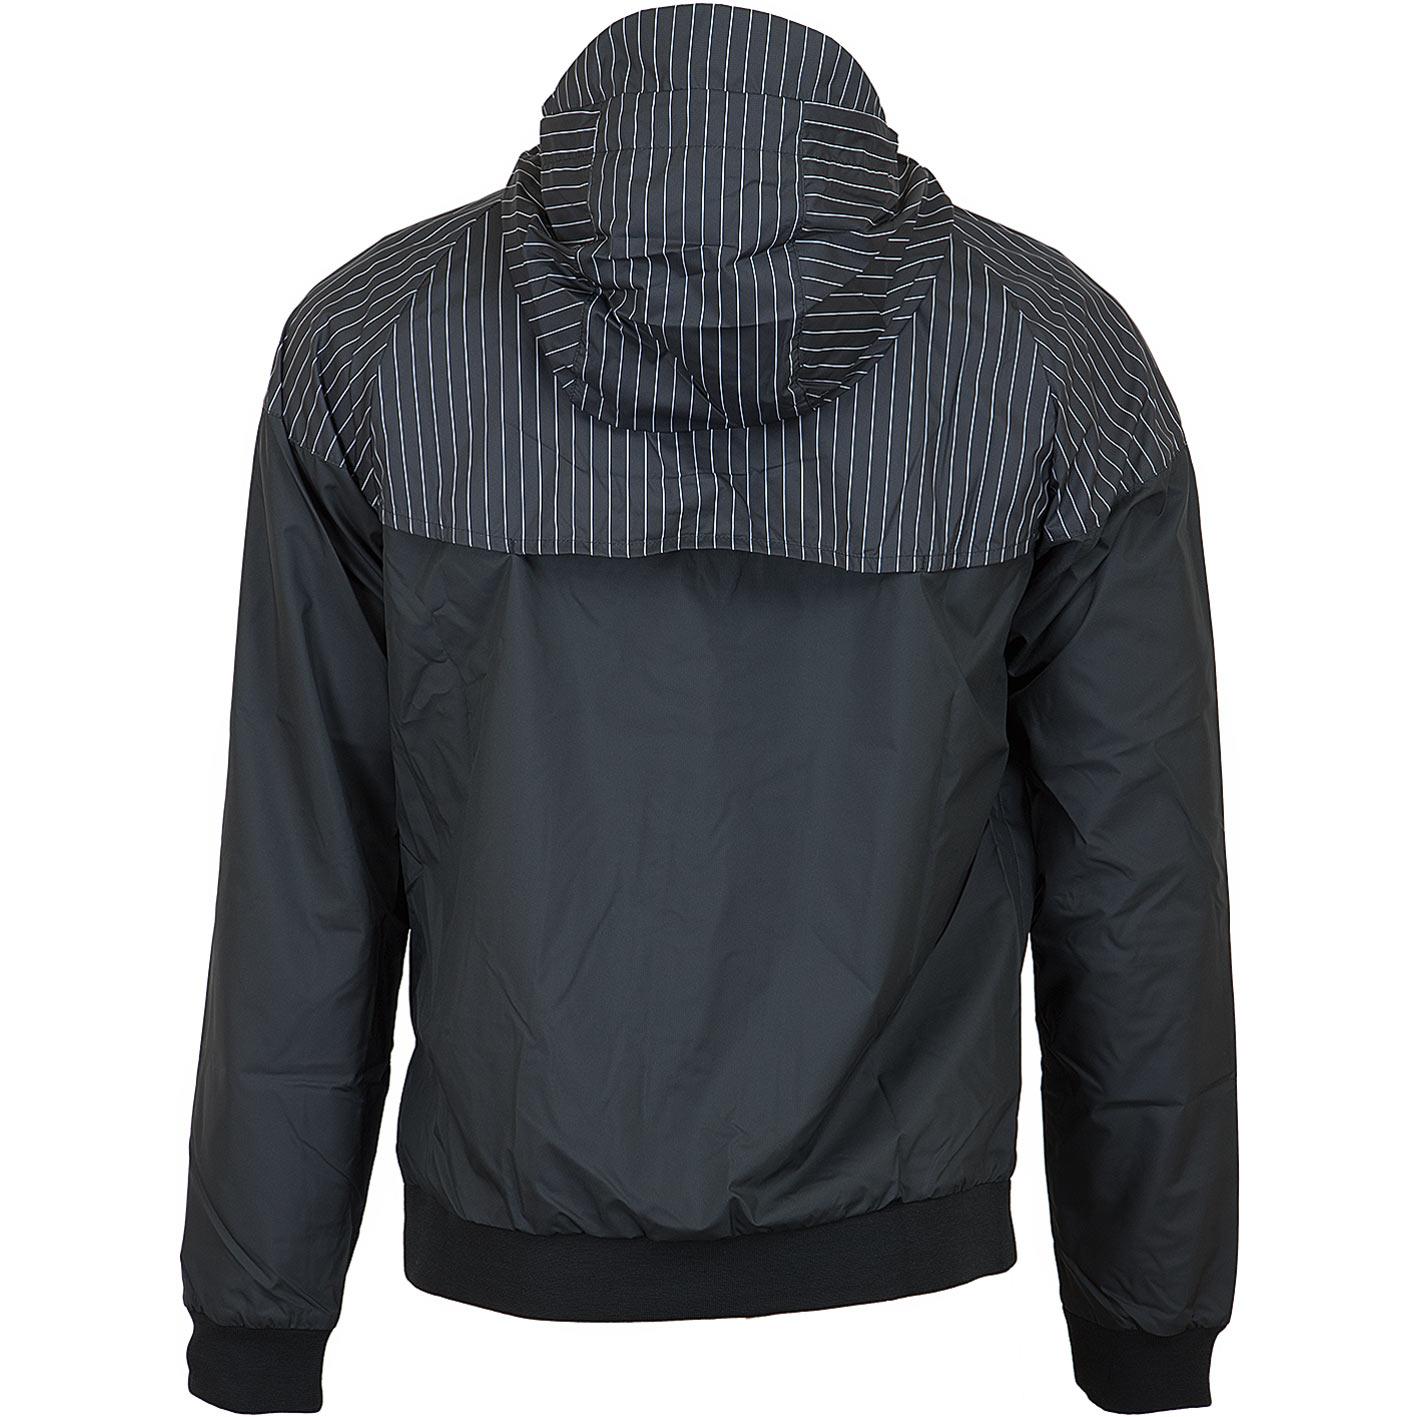 ☆ Nike Jacke HD Reg GFX schwarz/weiß - hier bestellen!